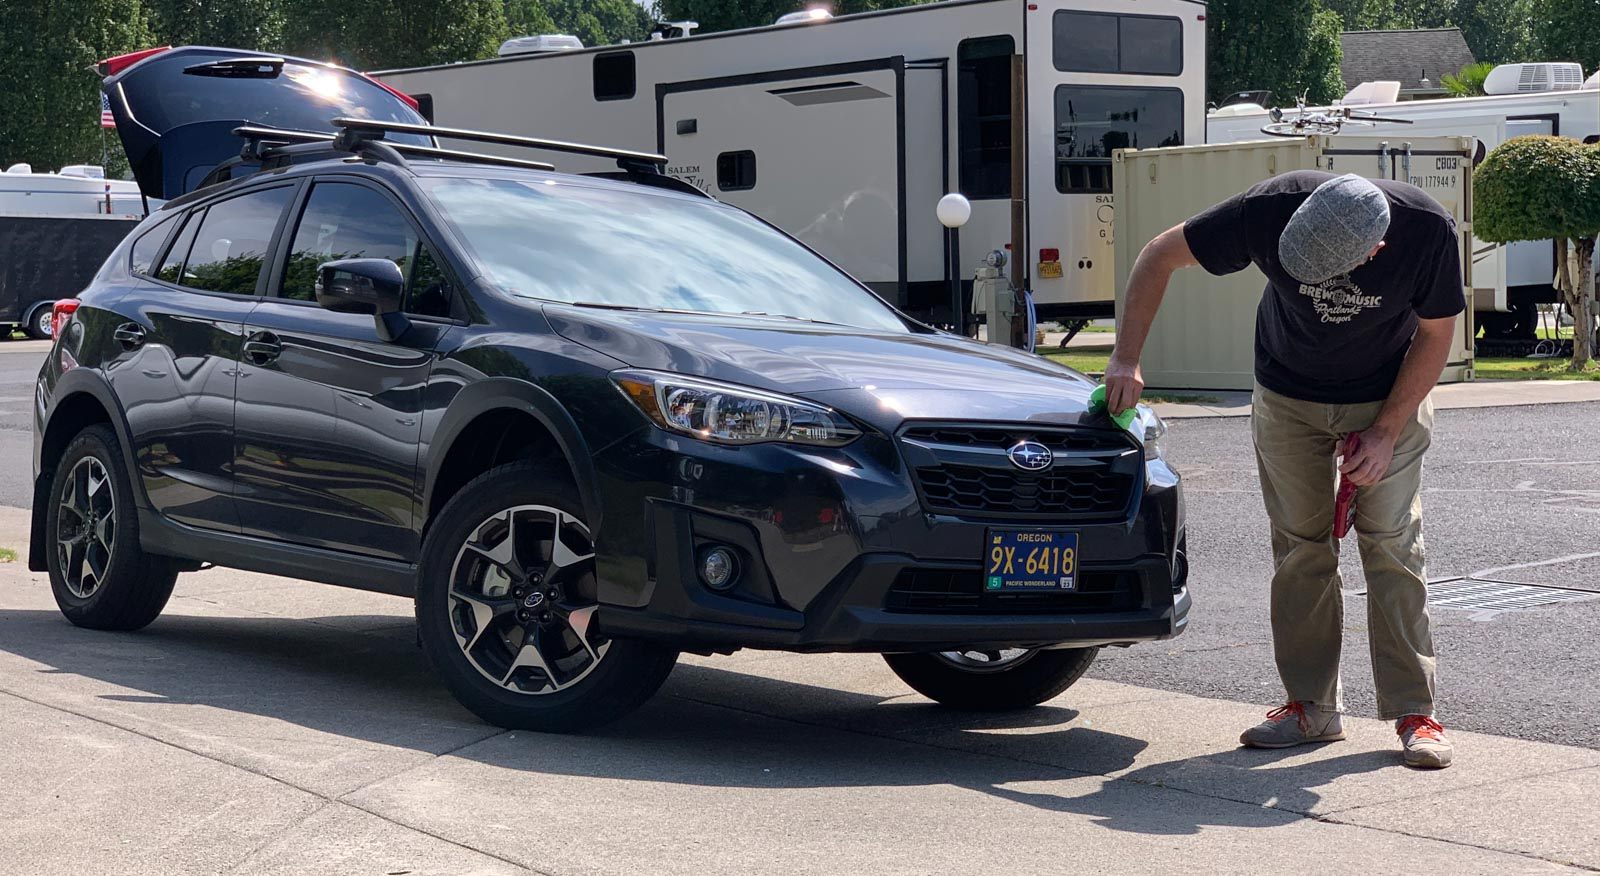 Jason got a new Subaru Crosstrek